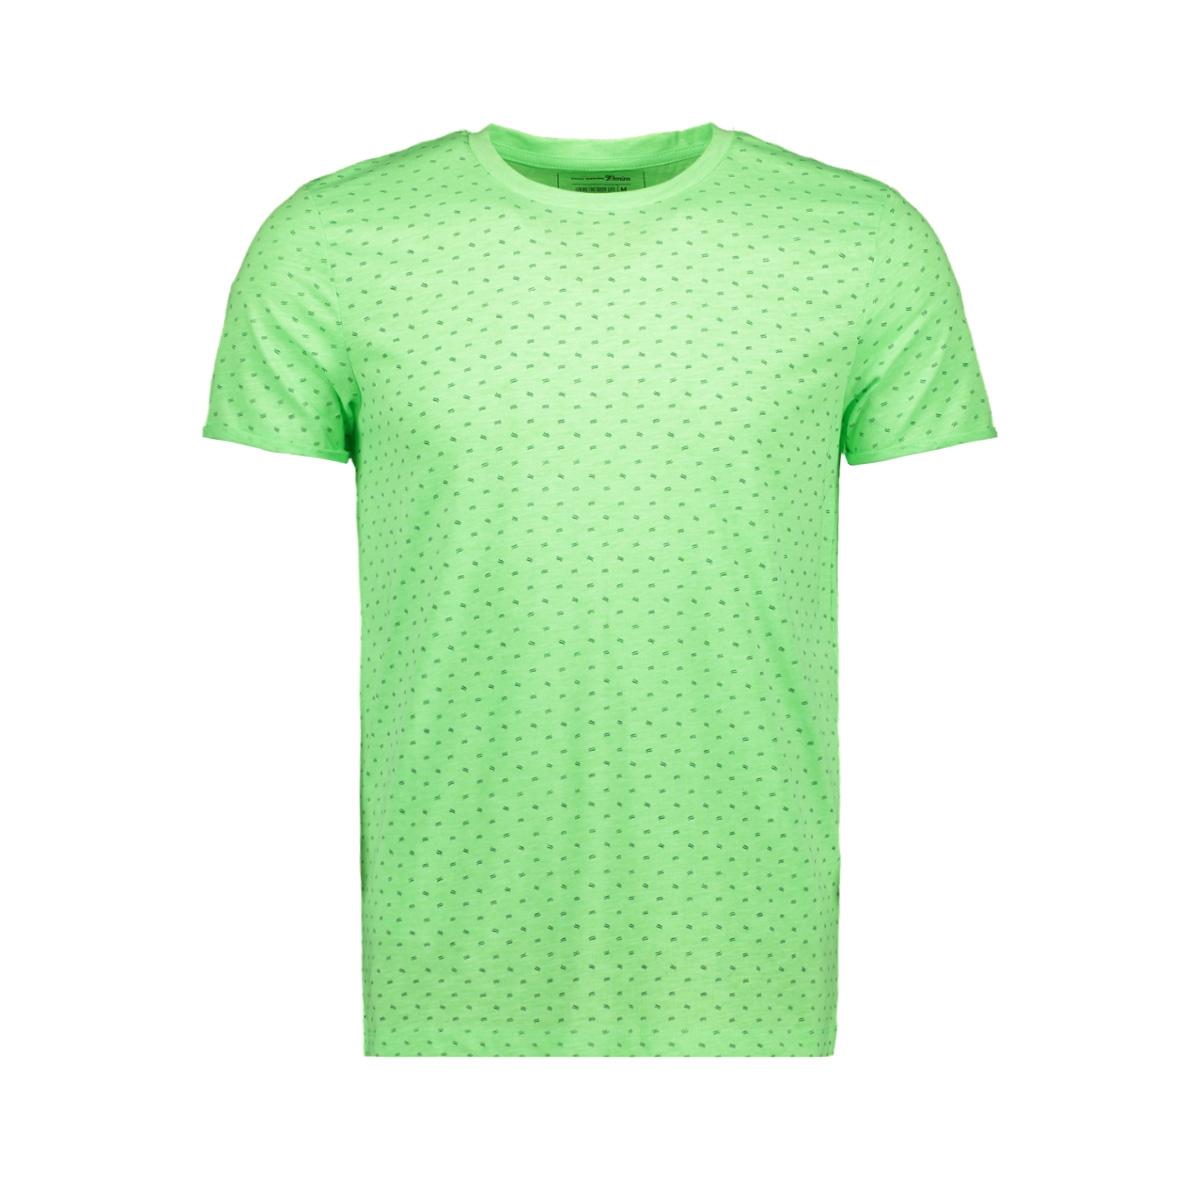 t shirt met print 1011138xx12 tom tailor t-shirt 17829